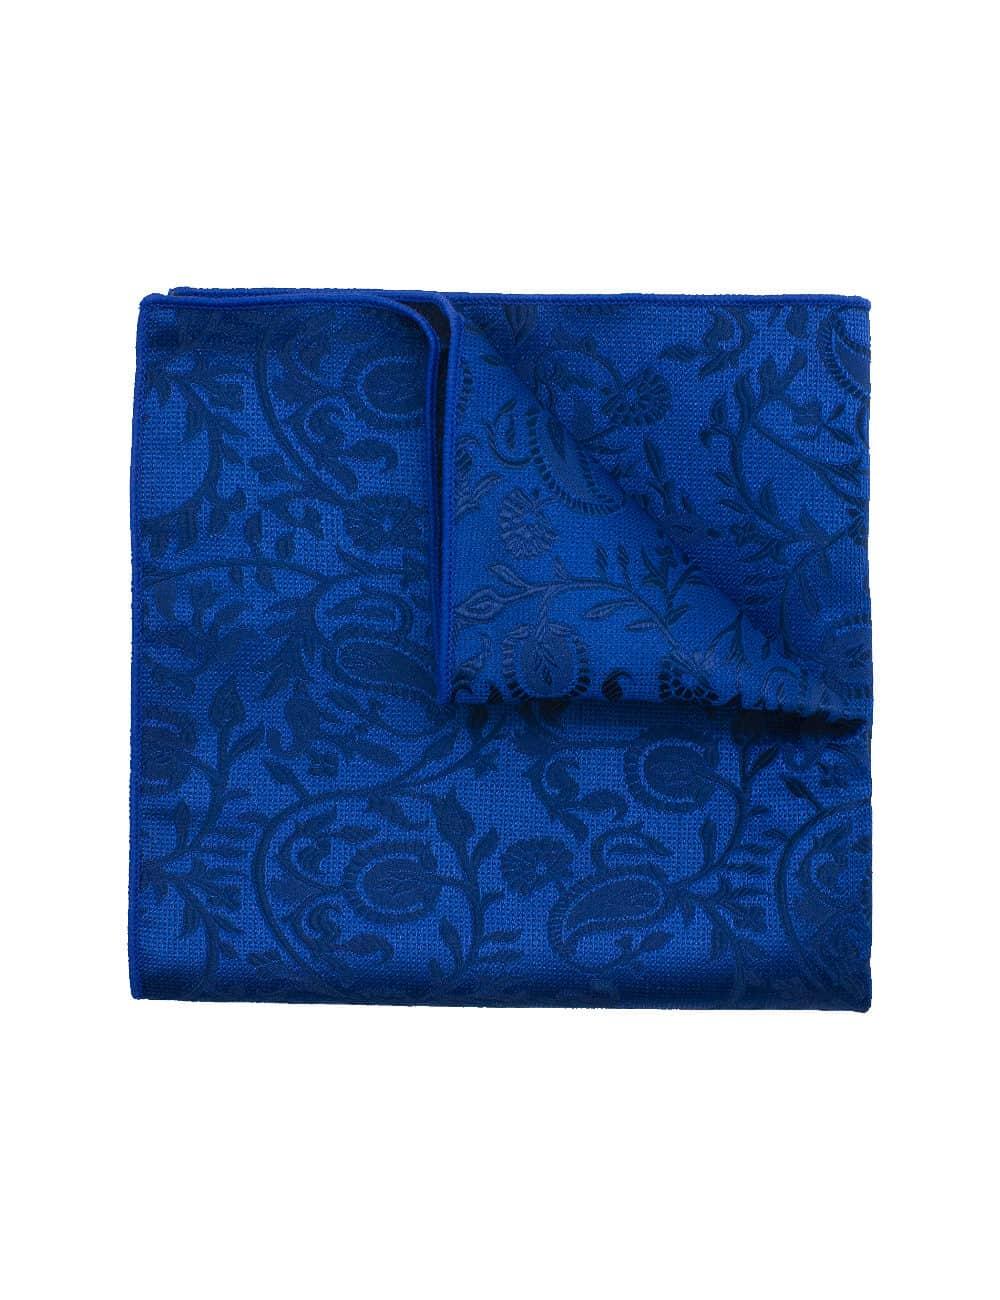 Blue Floral Woven Pocket Square PSQ41.9